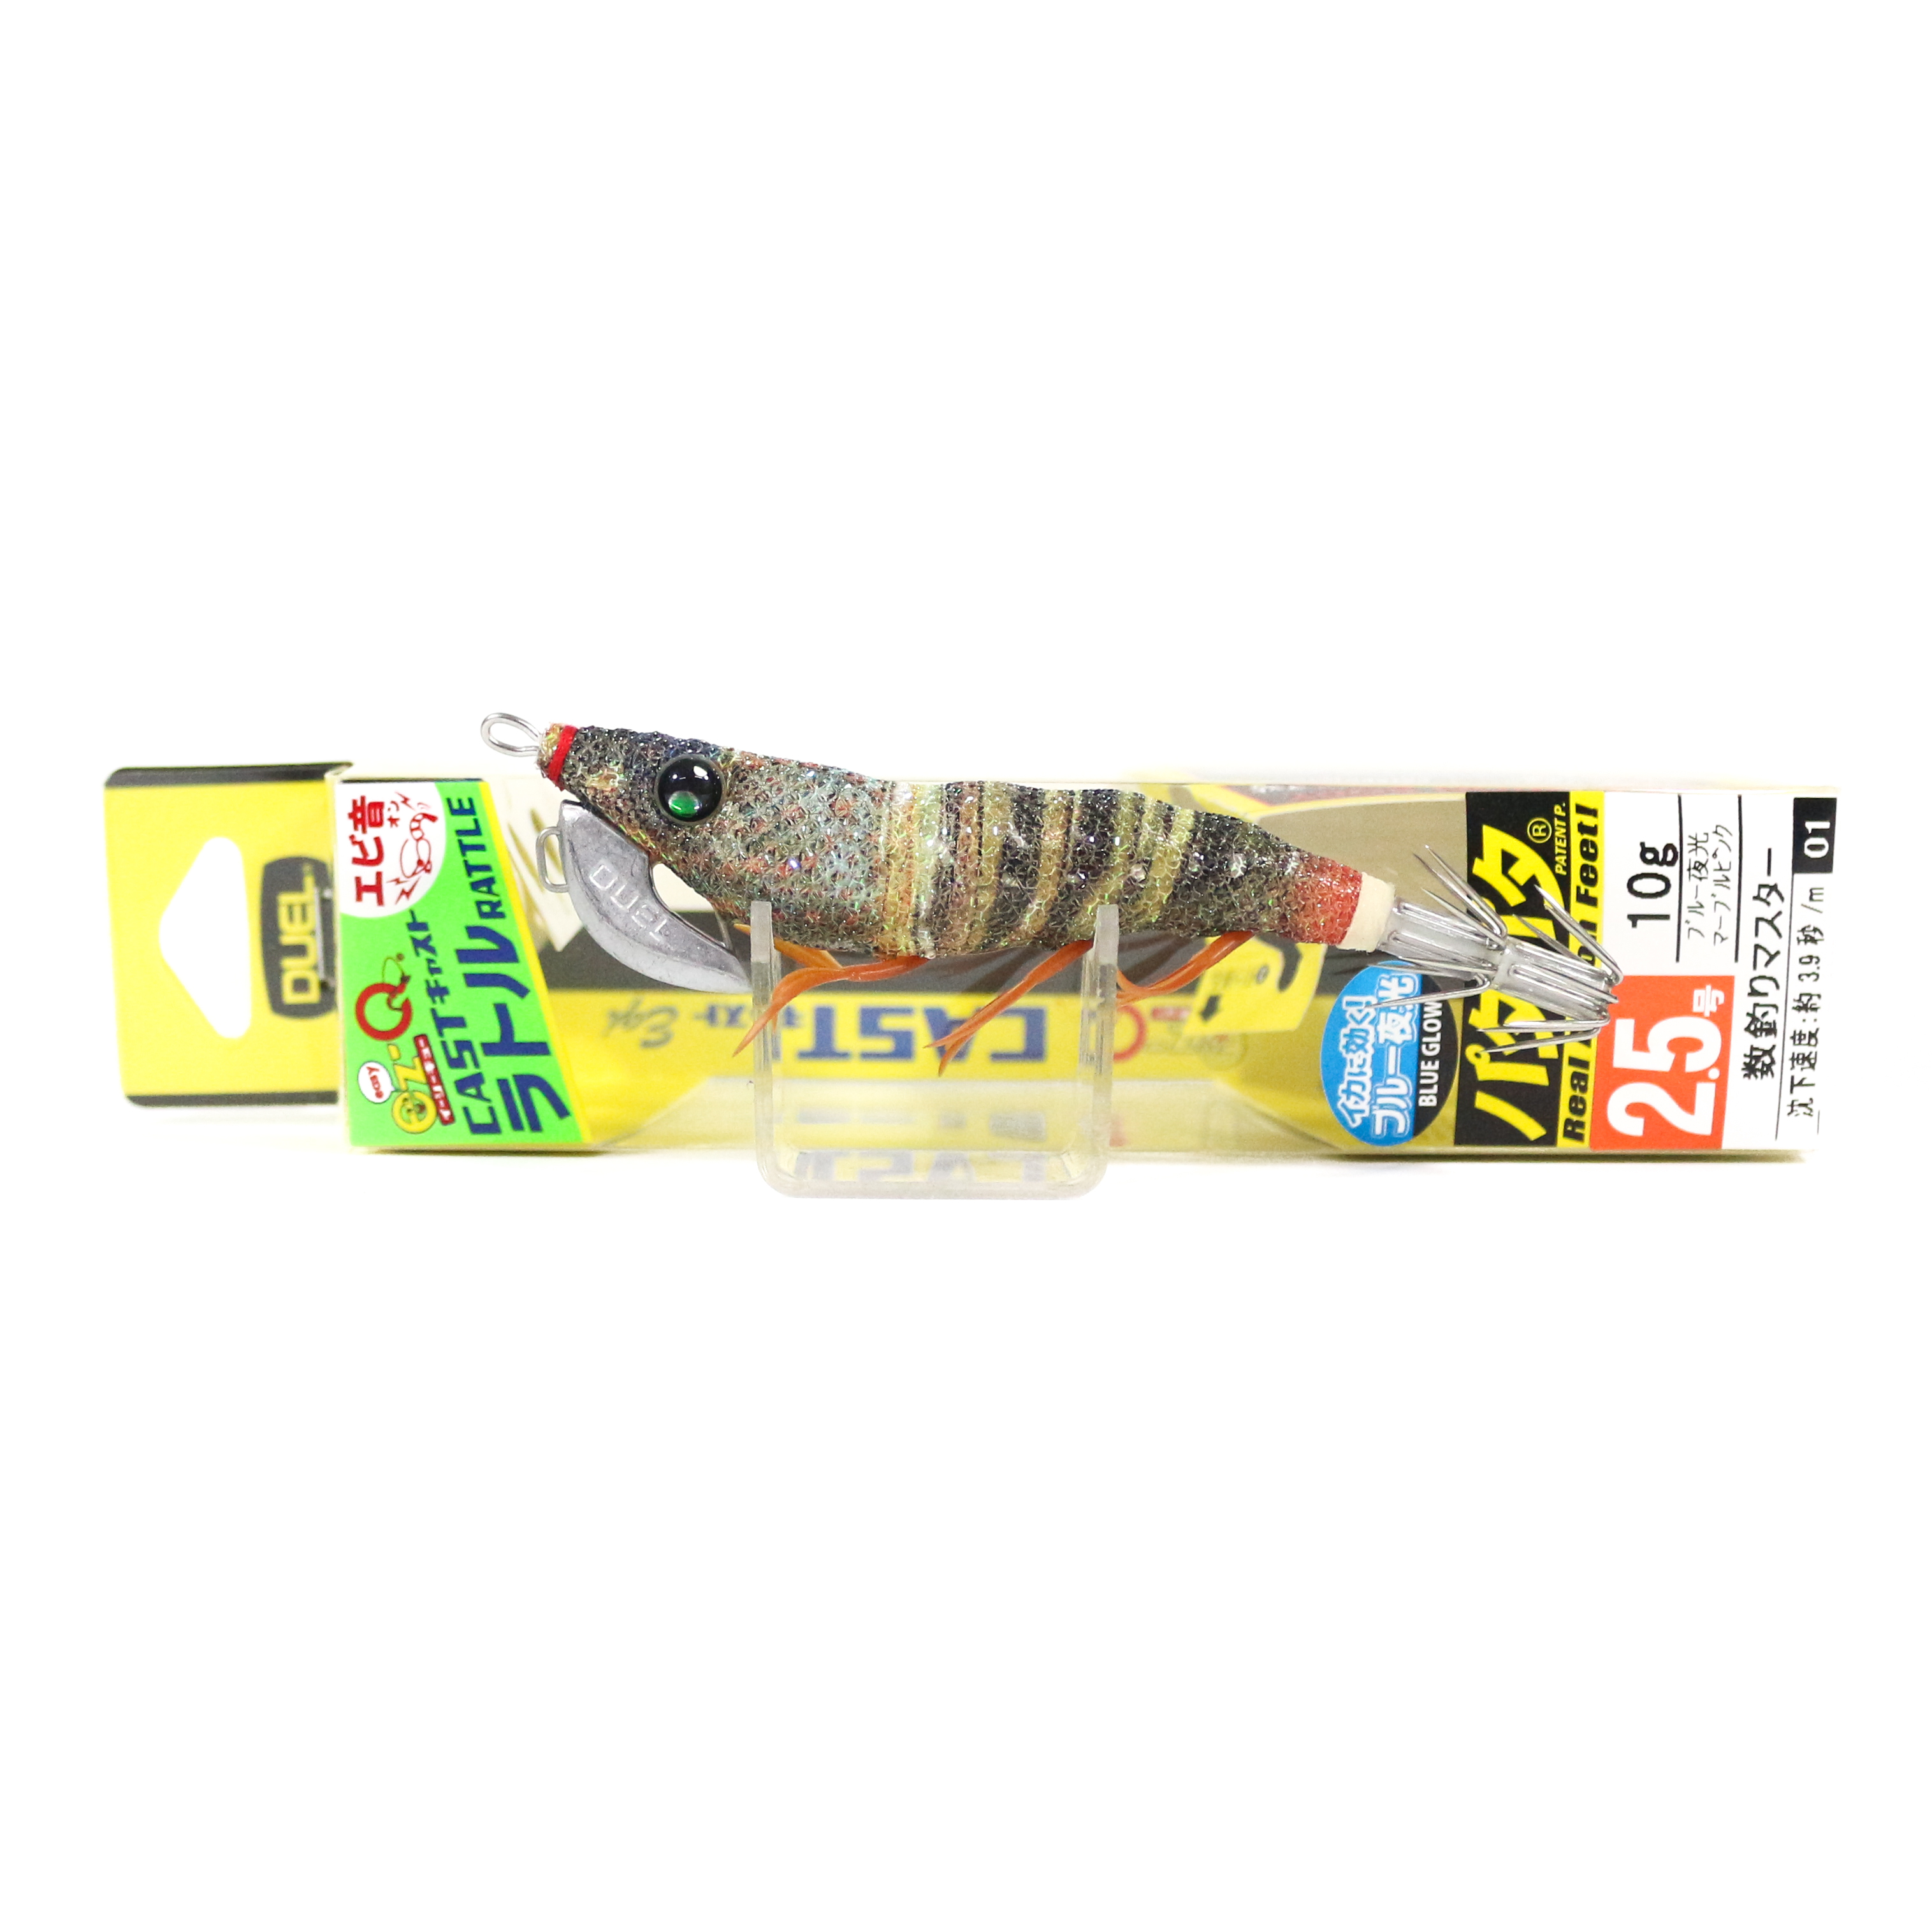 Yo Zuri Duel Egi EZ-Q Cast Rattle Squid Jig Sinking Lure 2.5 A1690-KVRP 9345